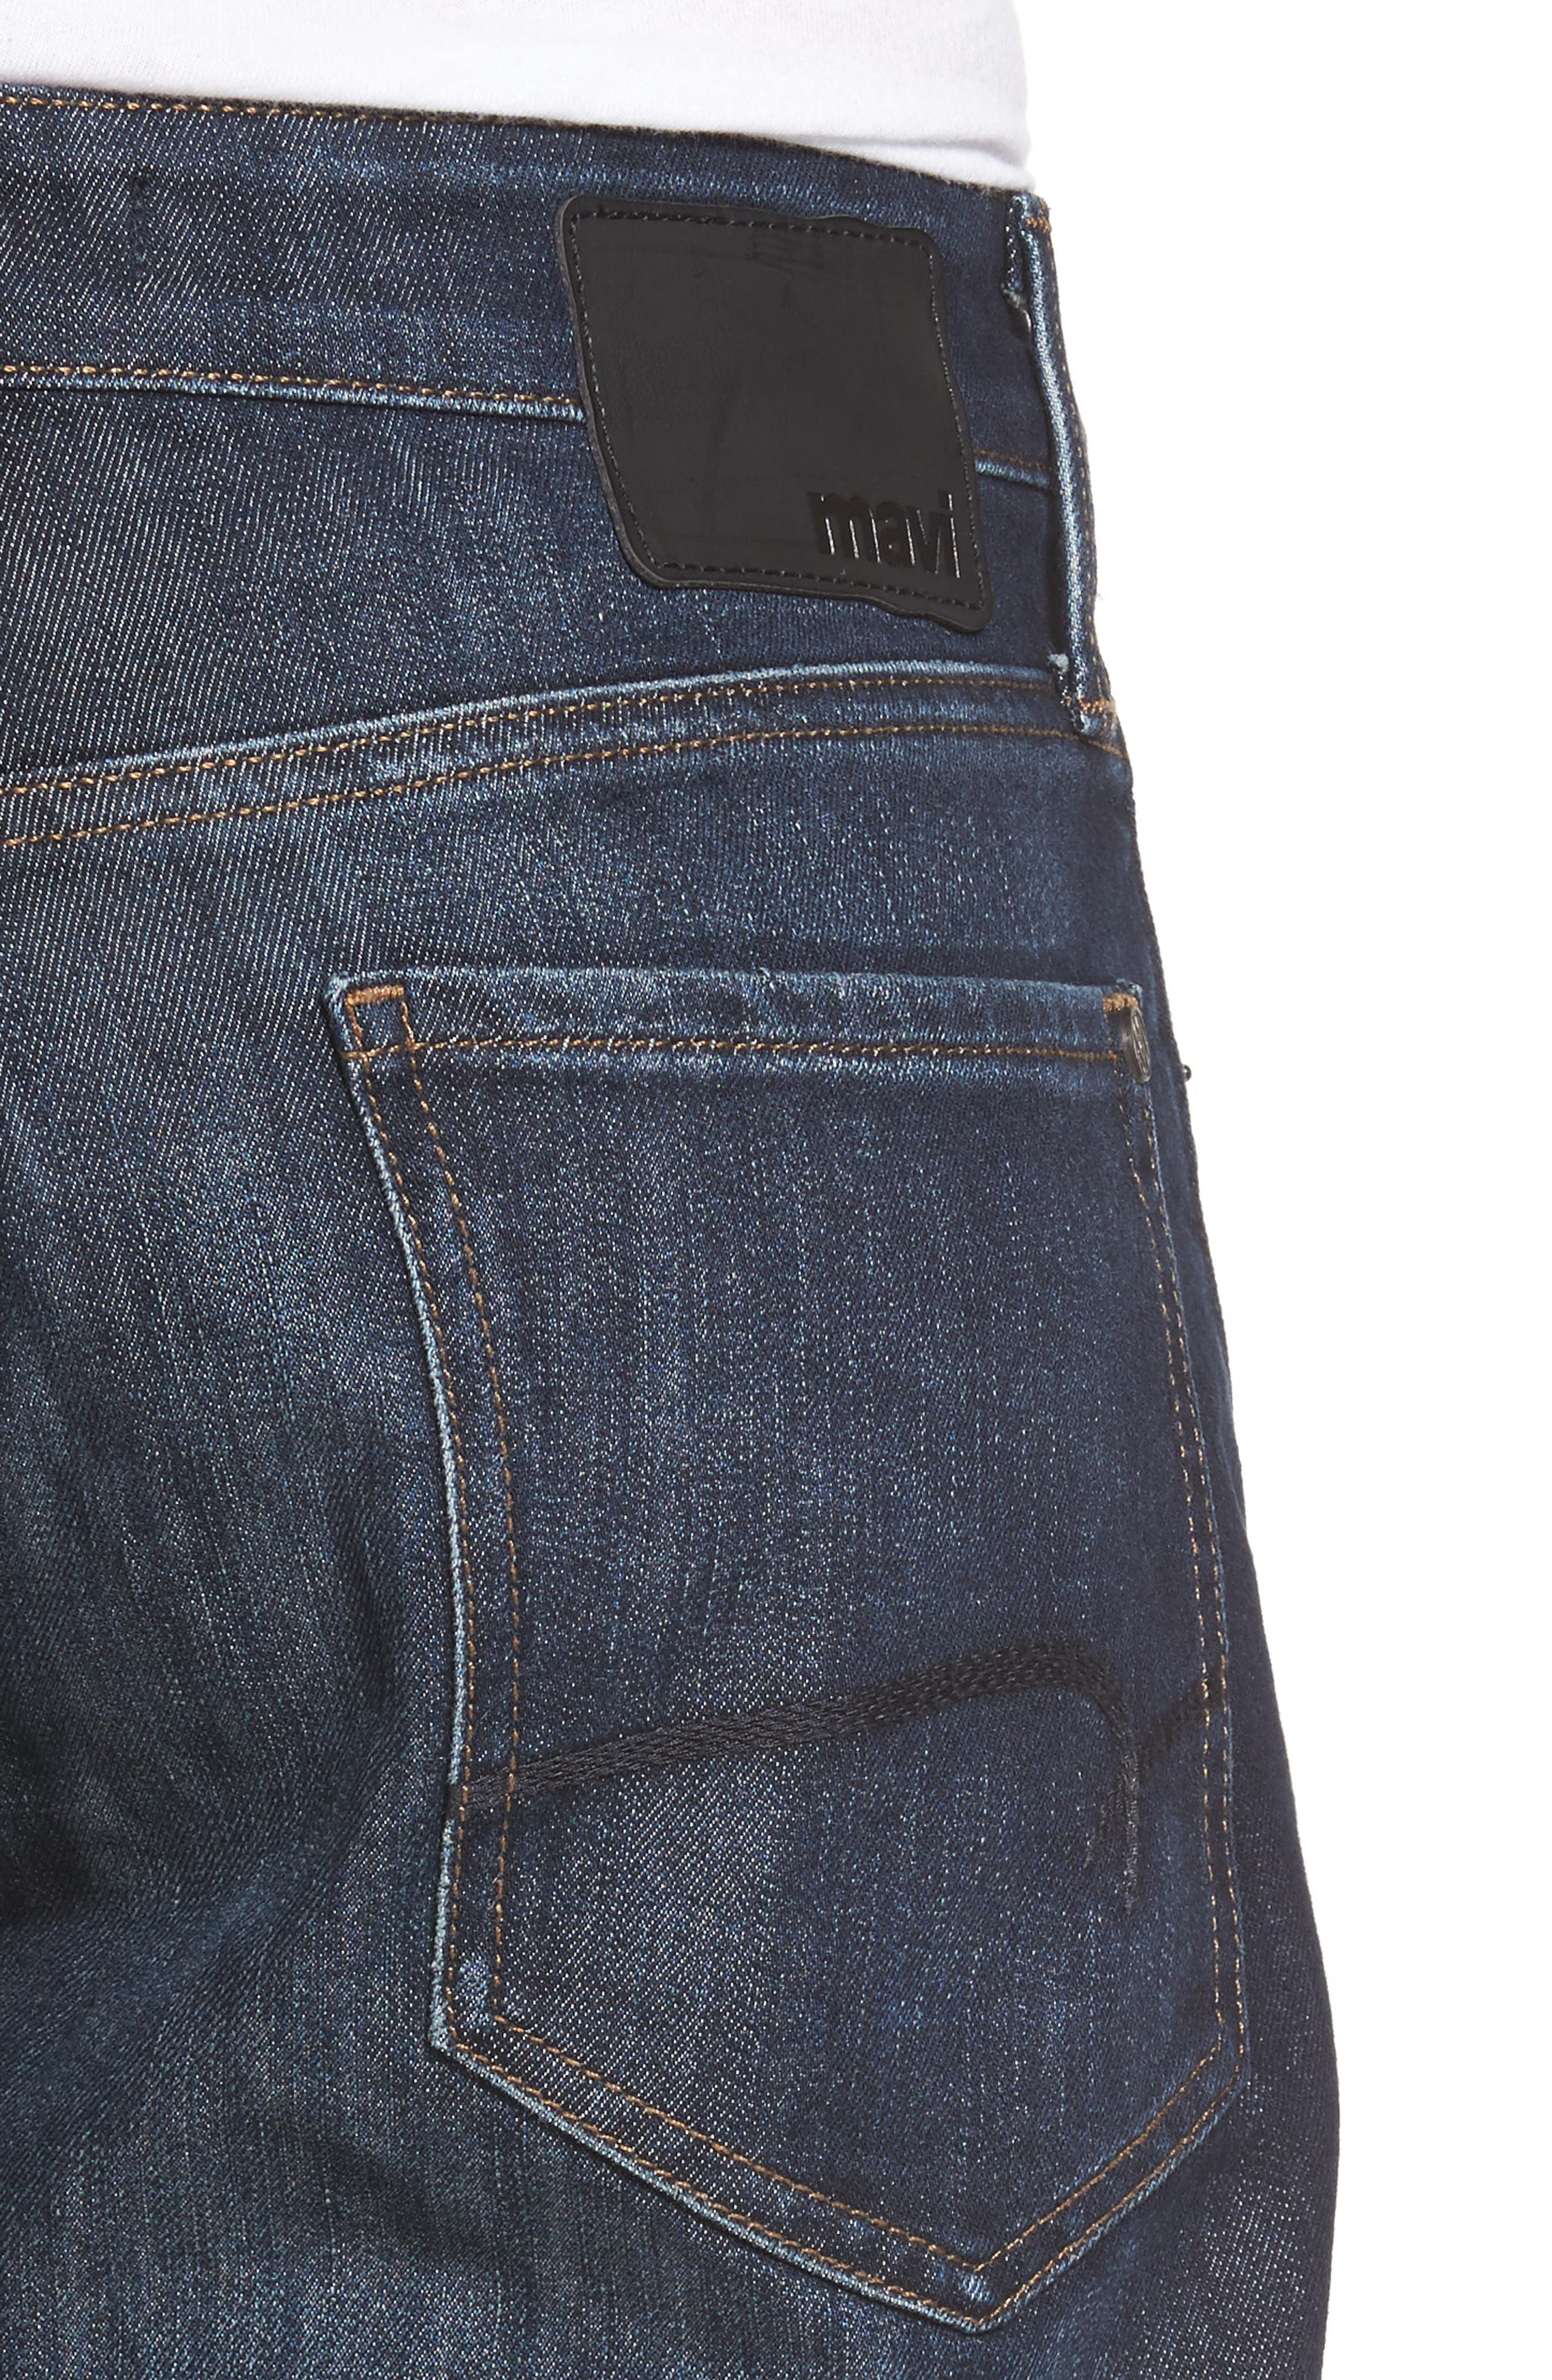 Matt Relaxed Fit Jeans,                             Alternate thumbnail 4, color,                             DARK STANFORD